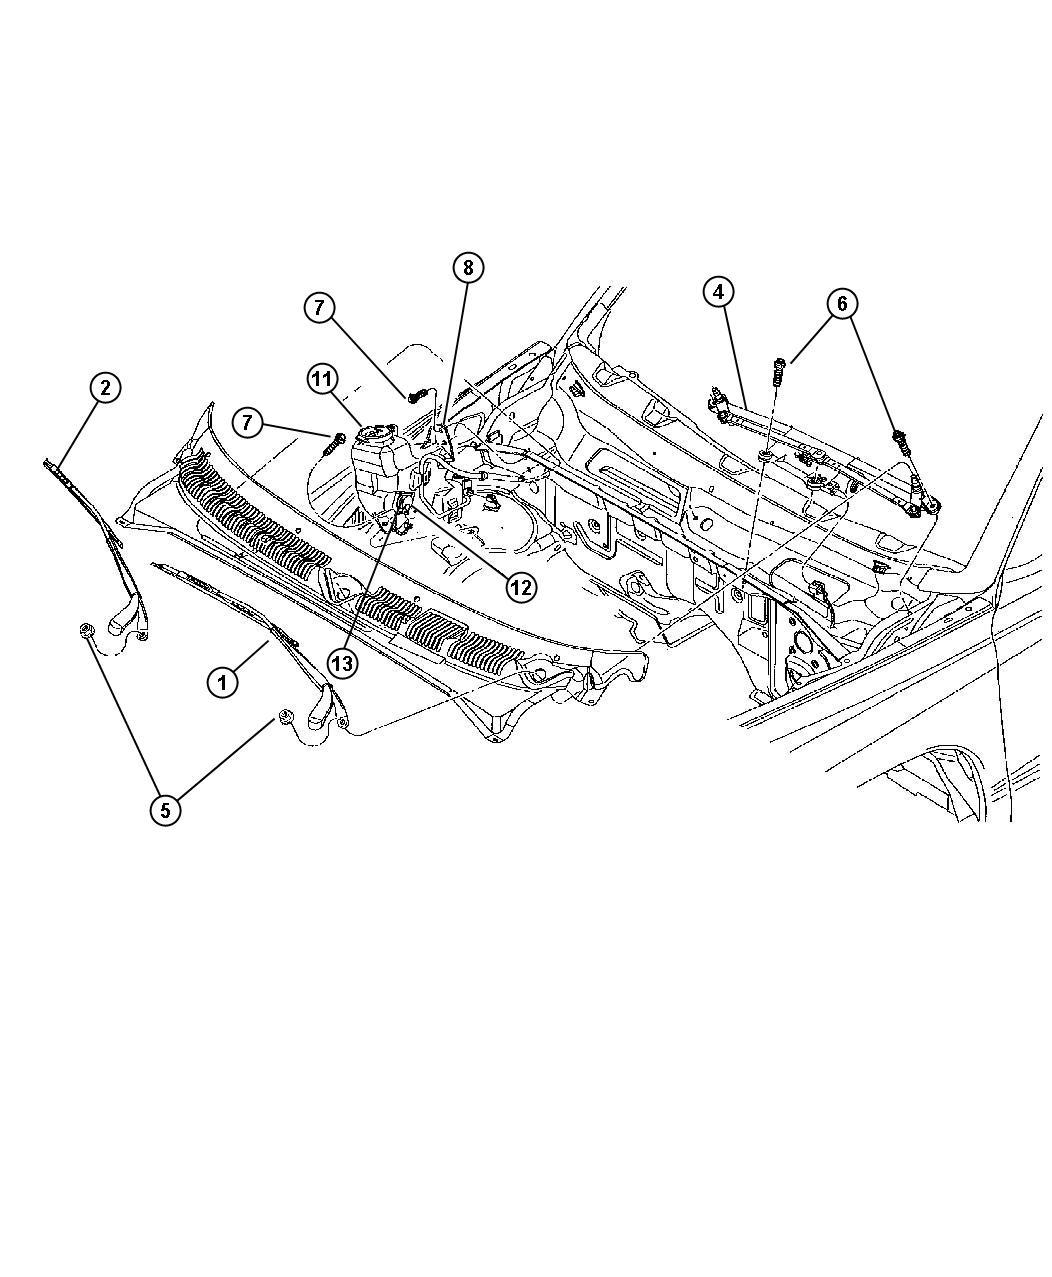 1968 camaro windshield wiper wiring diagram catalogue of 4 wire ford wiper motor wiring get